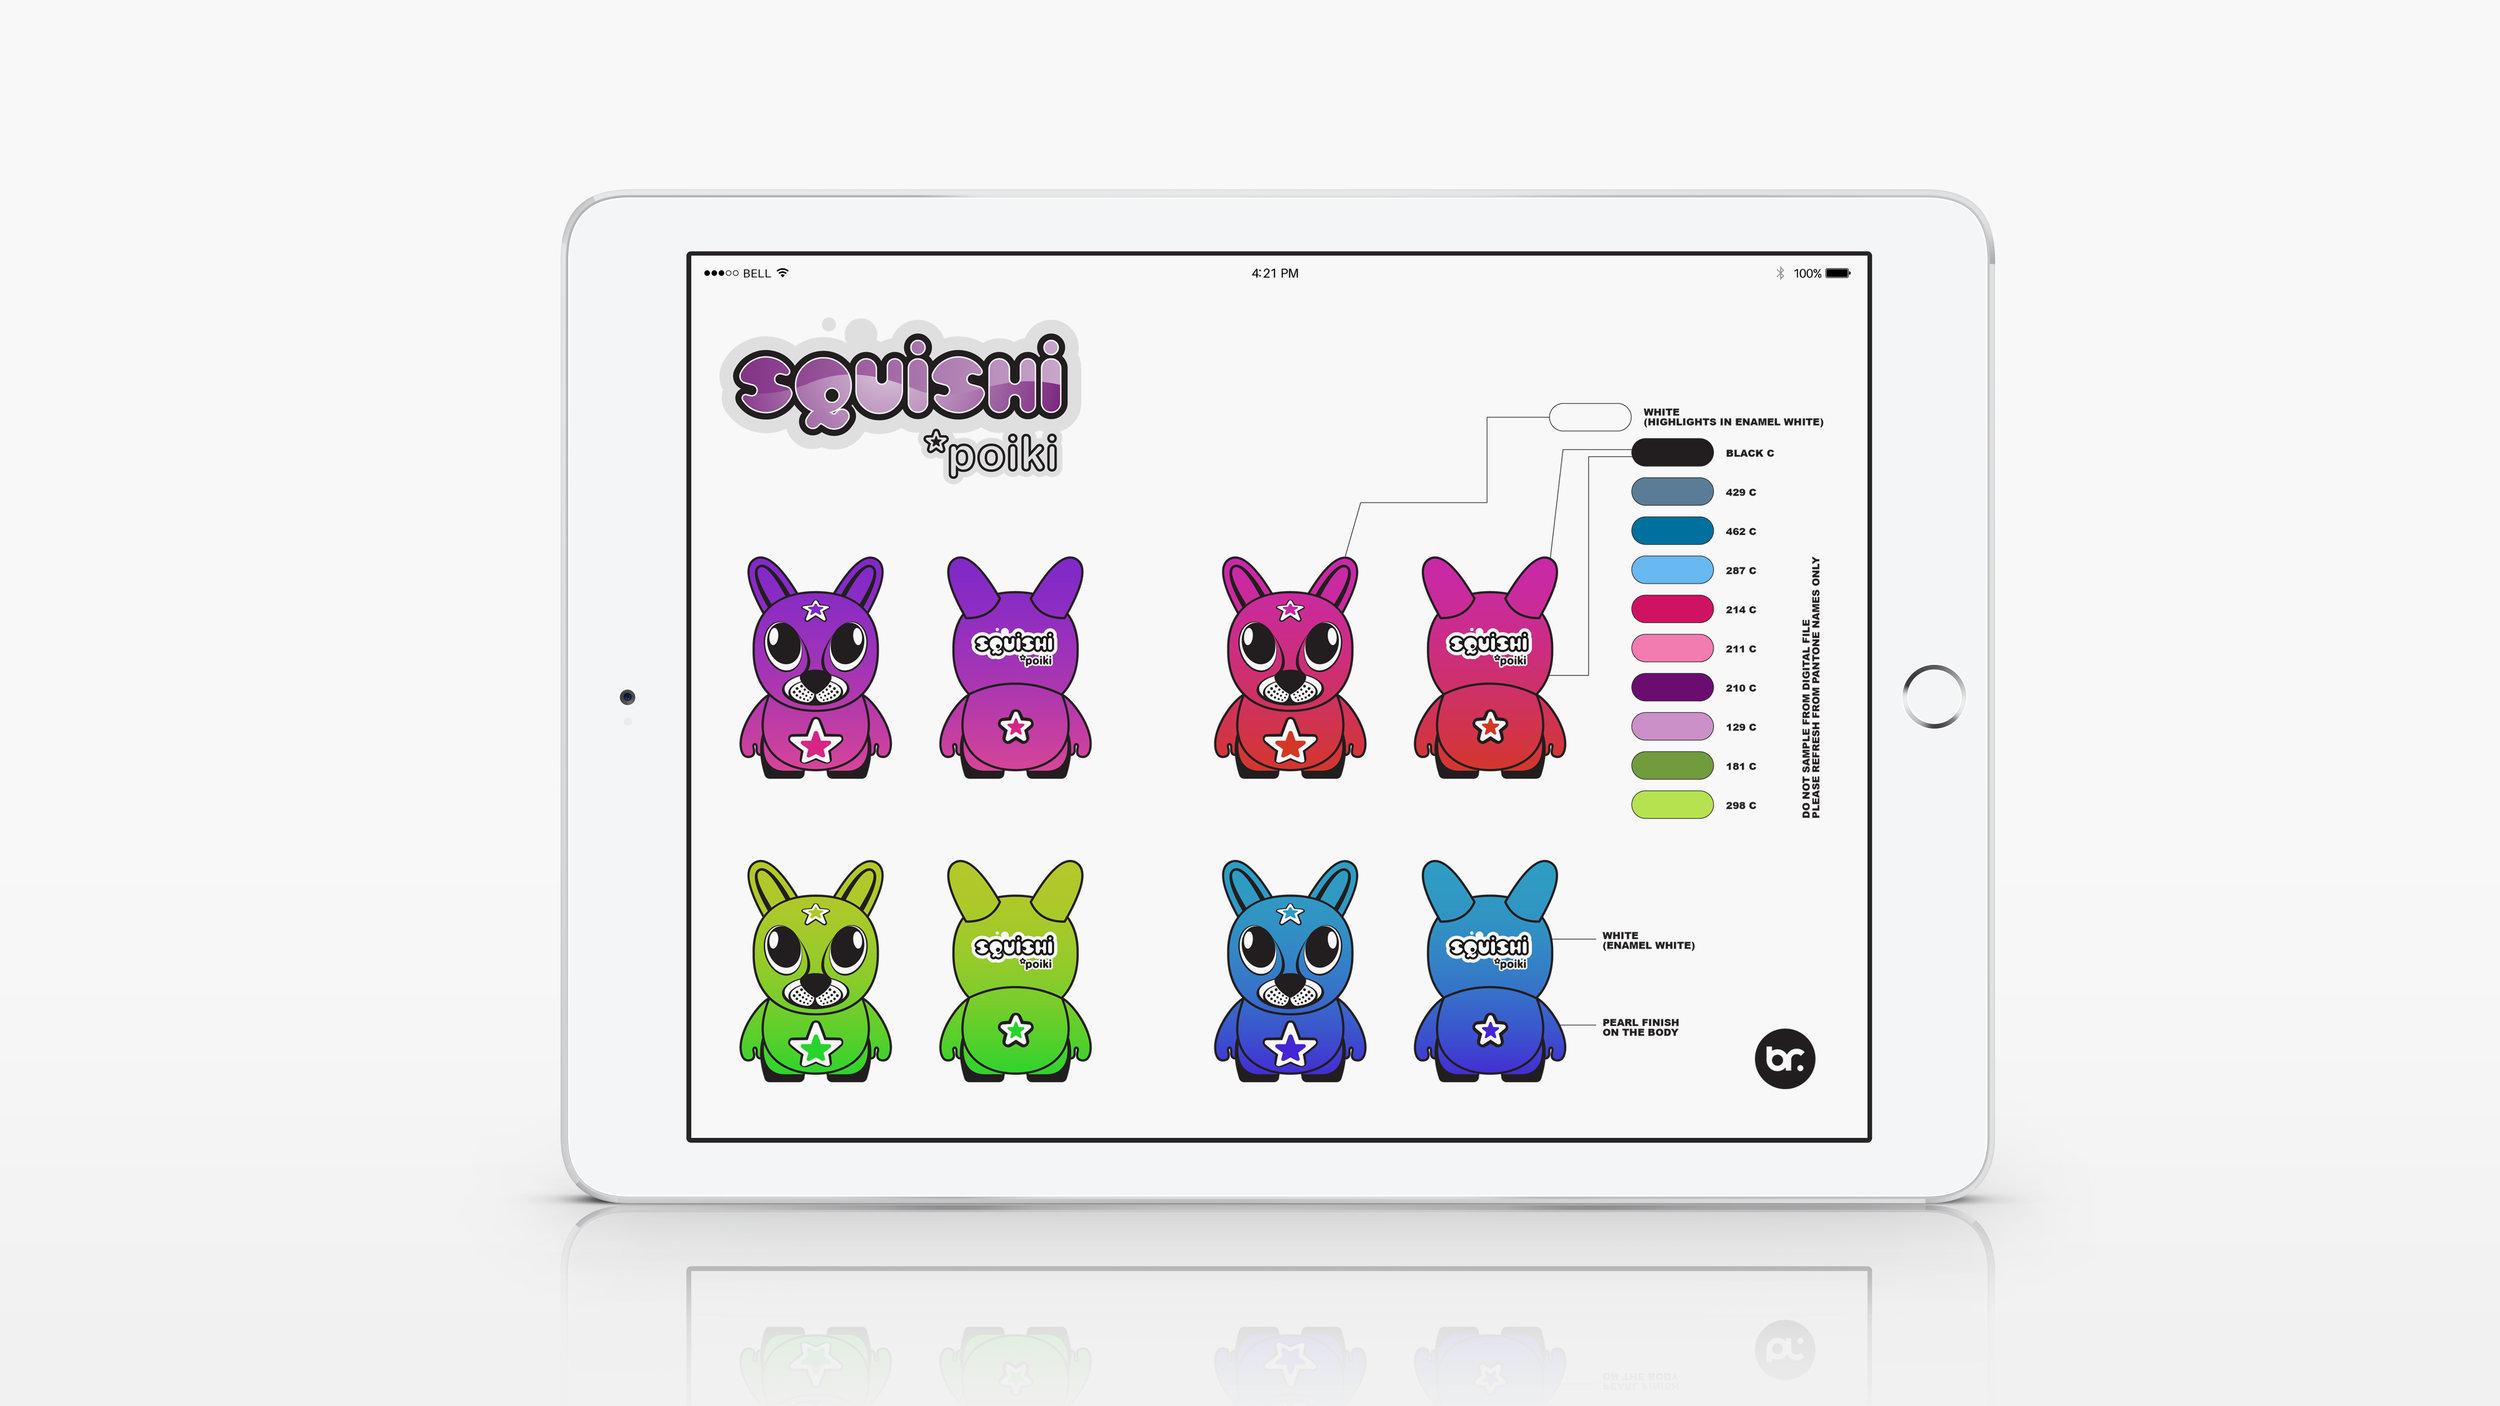 Brand_republica_squishi_key_finder_app_keyrings_tech_sheet_design.jpg